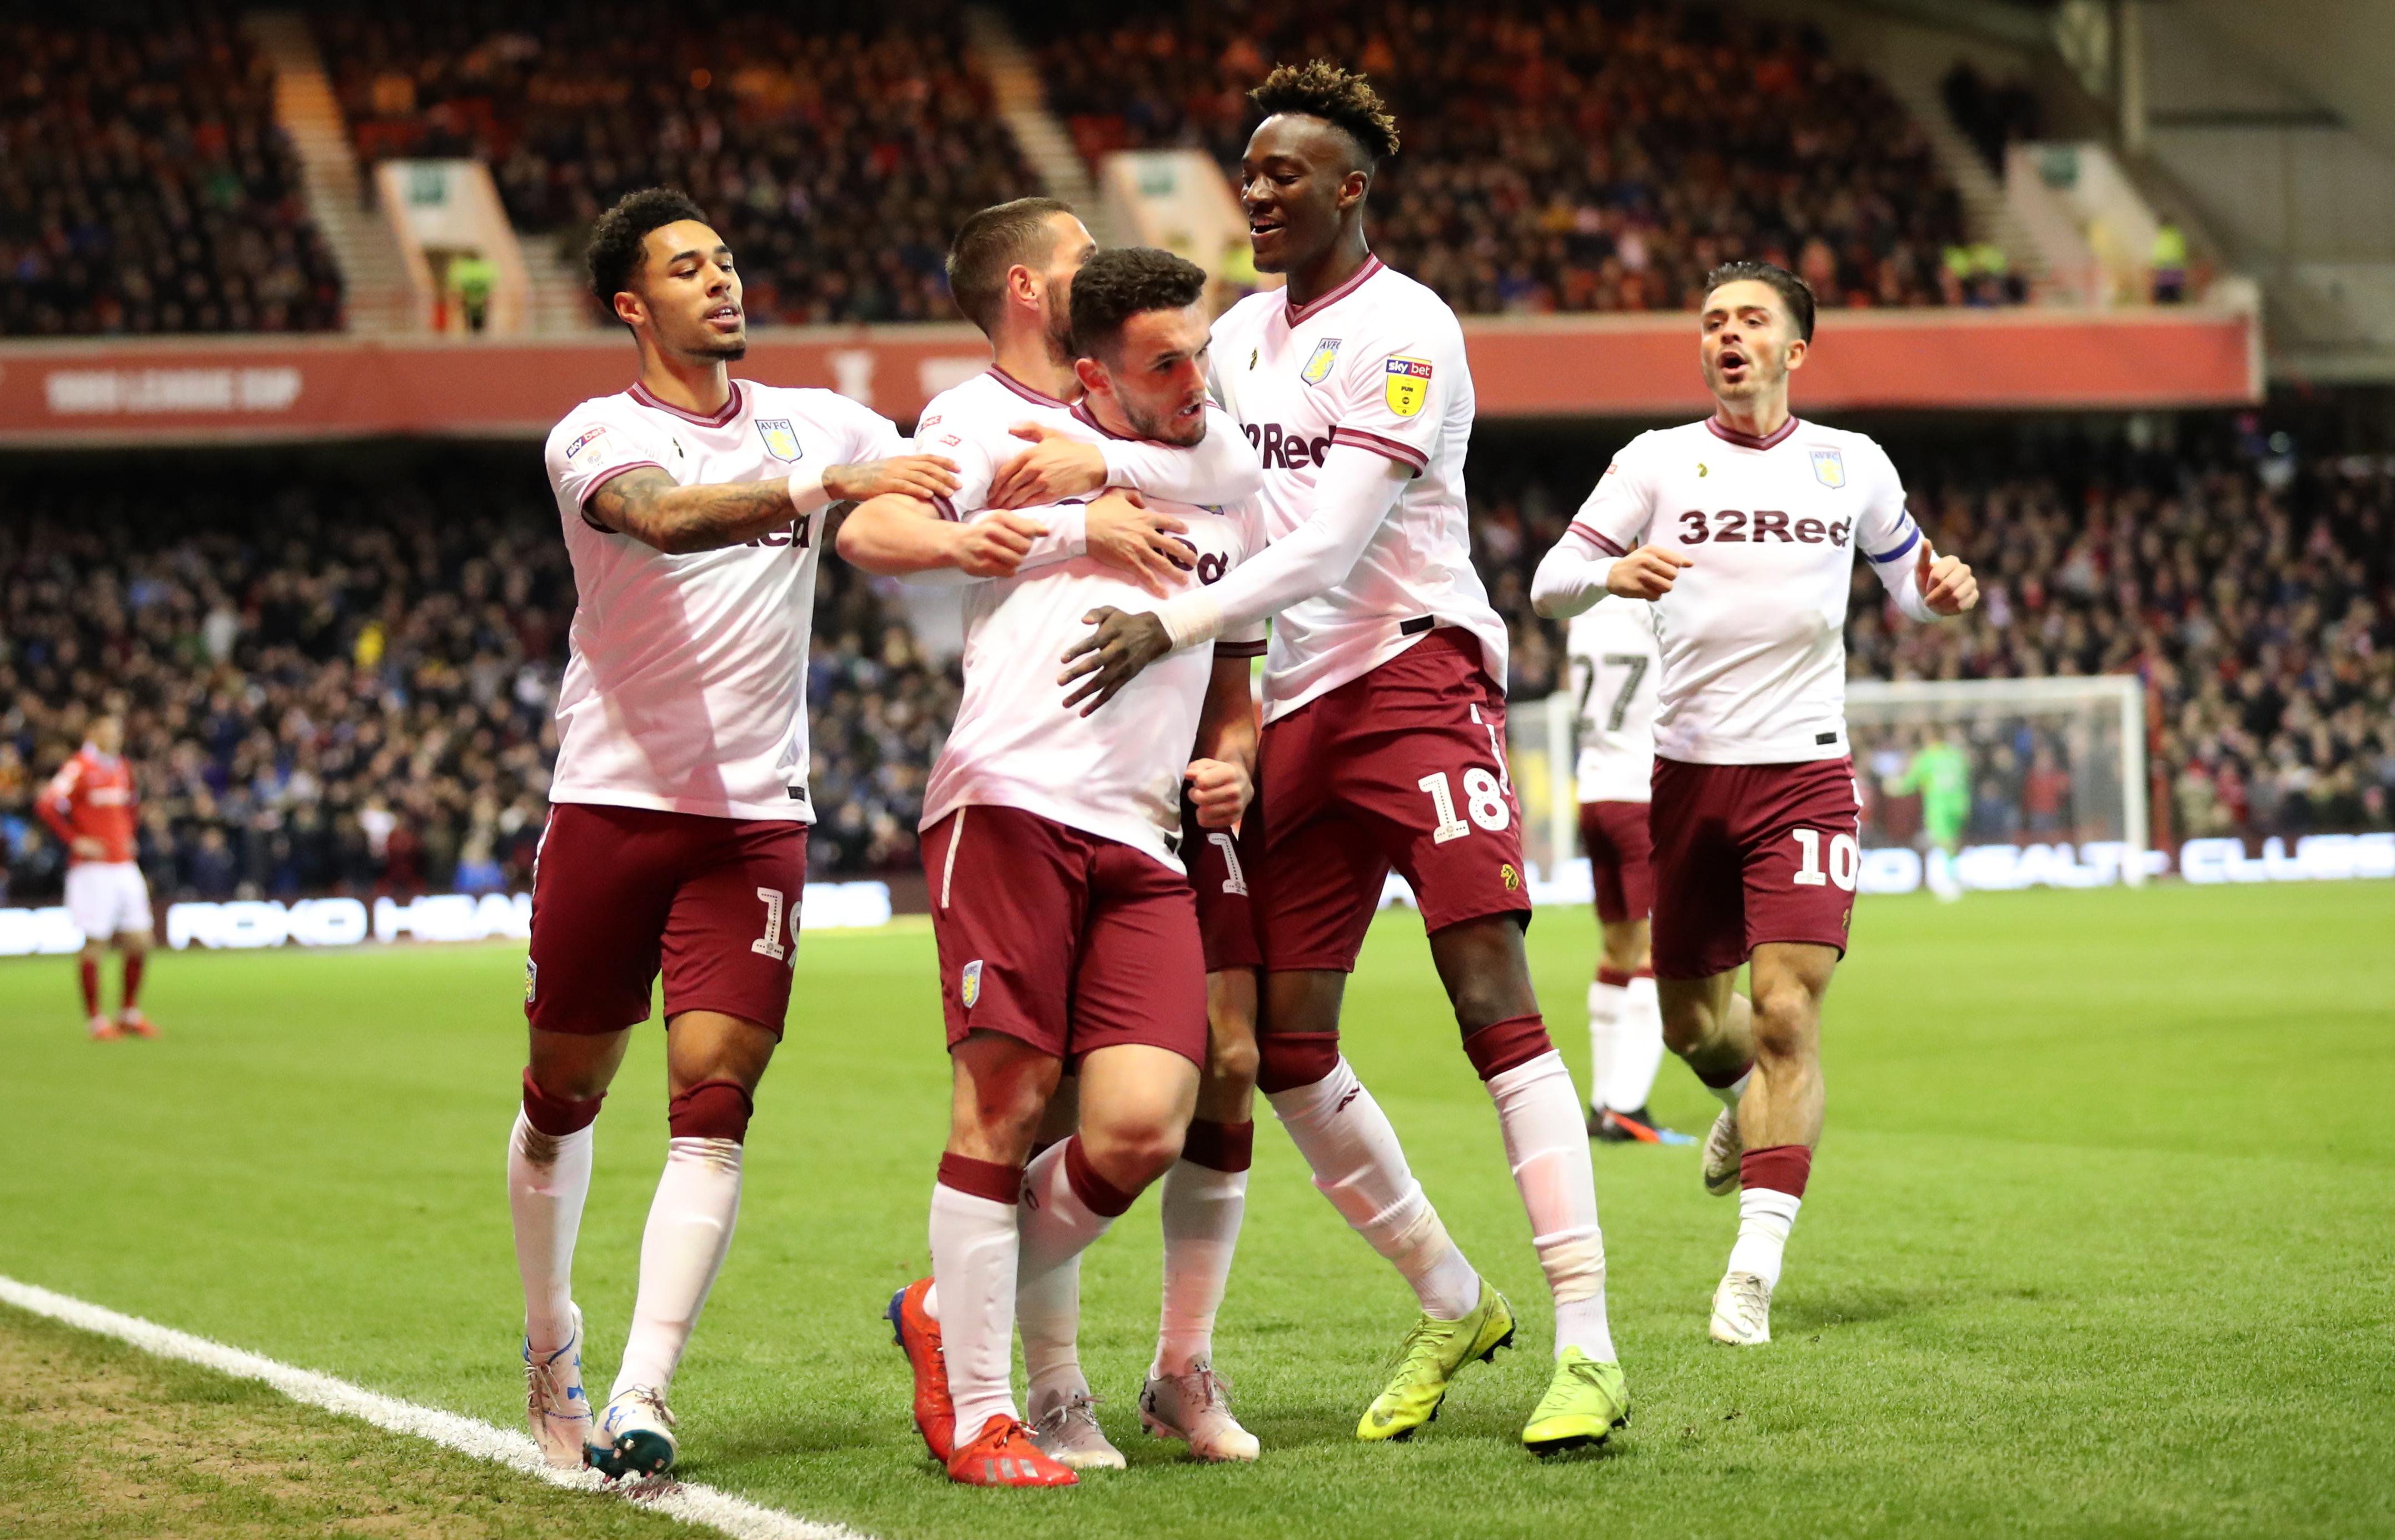 Nottingham Forest 1 - 3 Aston Villa: Storm John blows Forest down